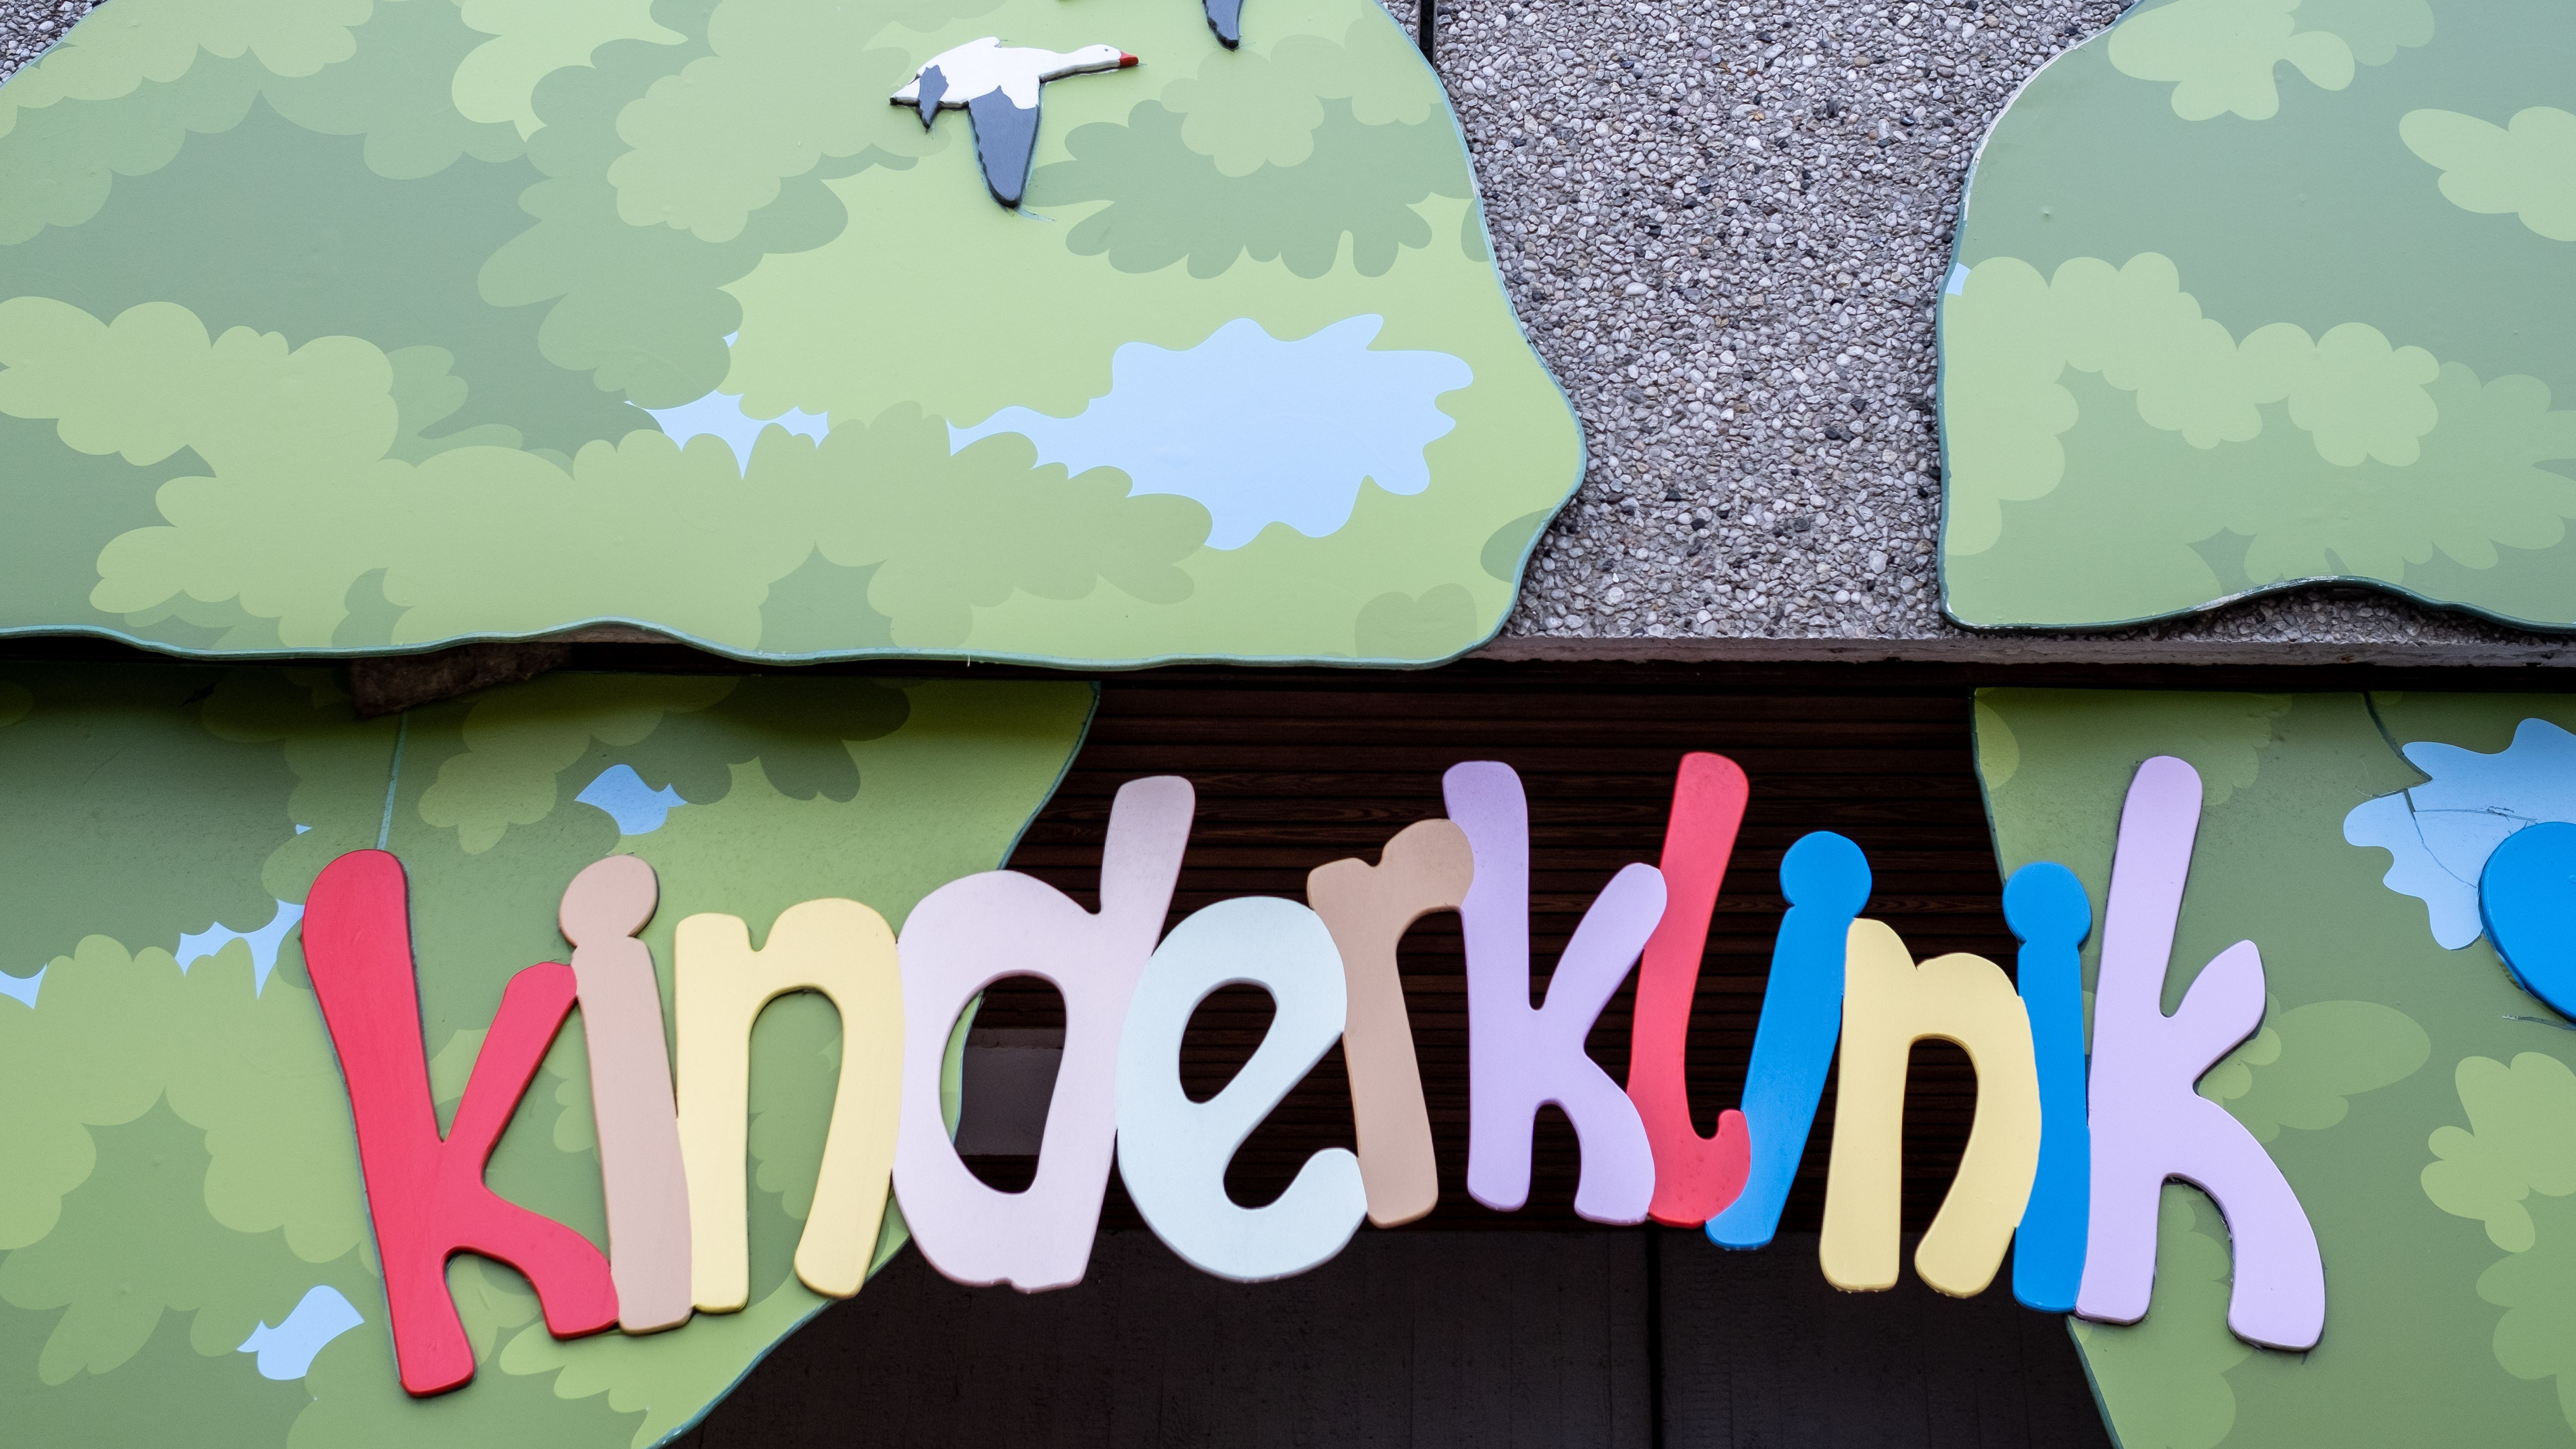 Das Wort Kinderklinik in bunten Buchstaben